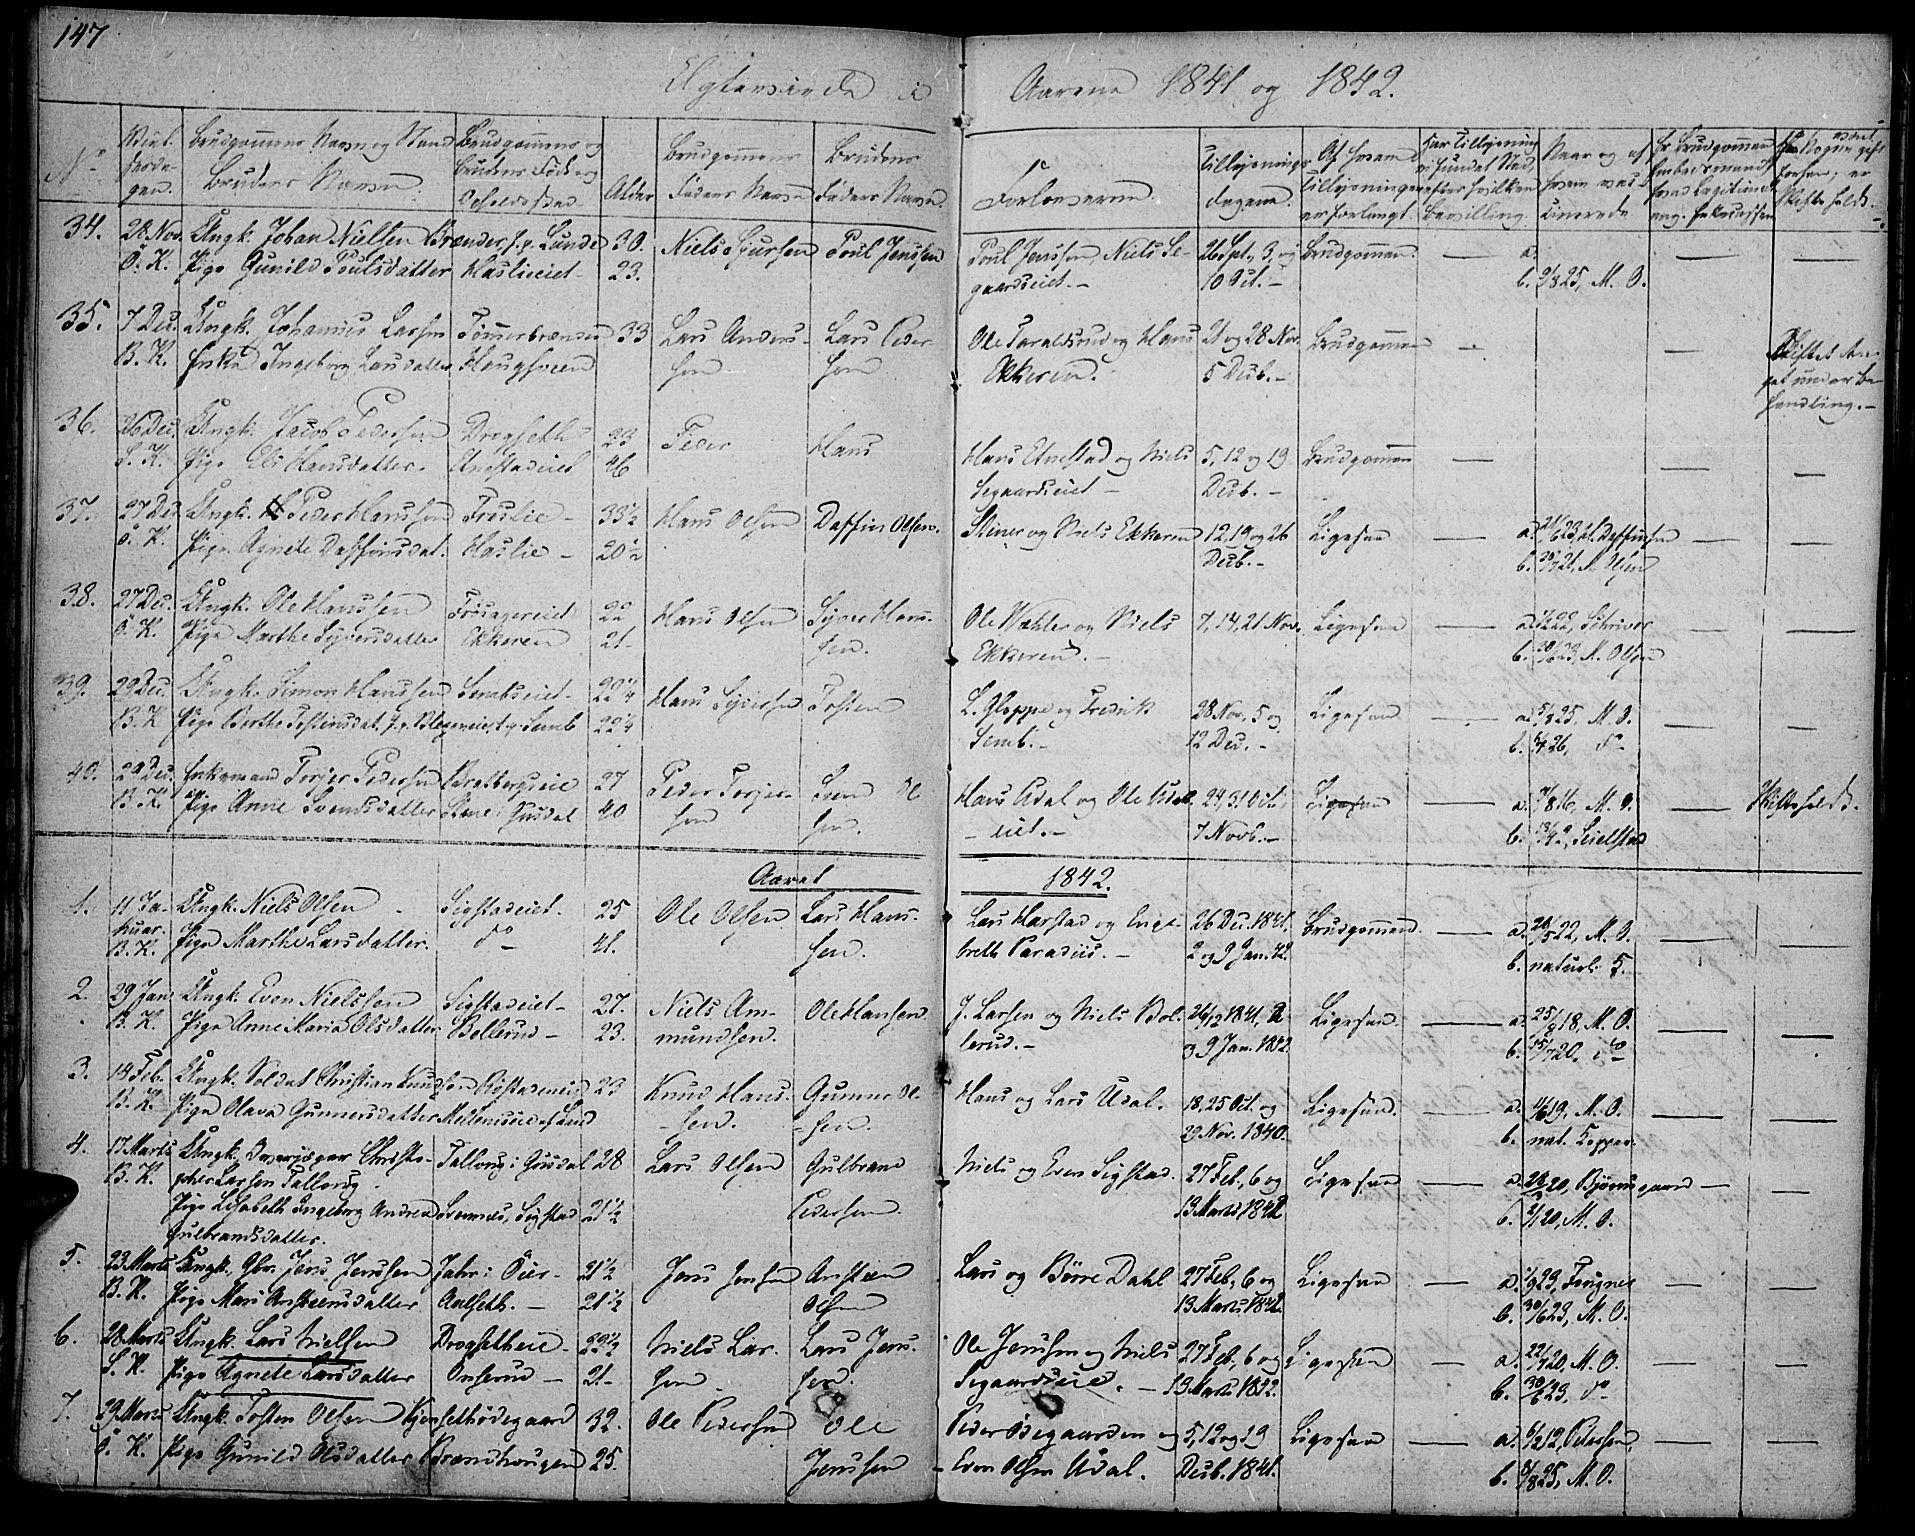 SAH, Biri prestekontor, Ministerialbok nr. 4, 1829-1842, s. 147